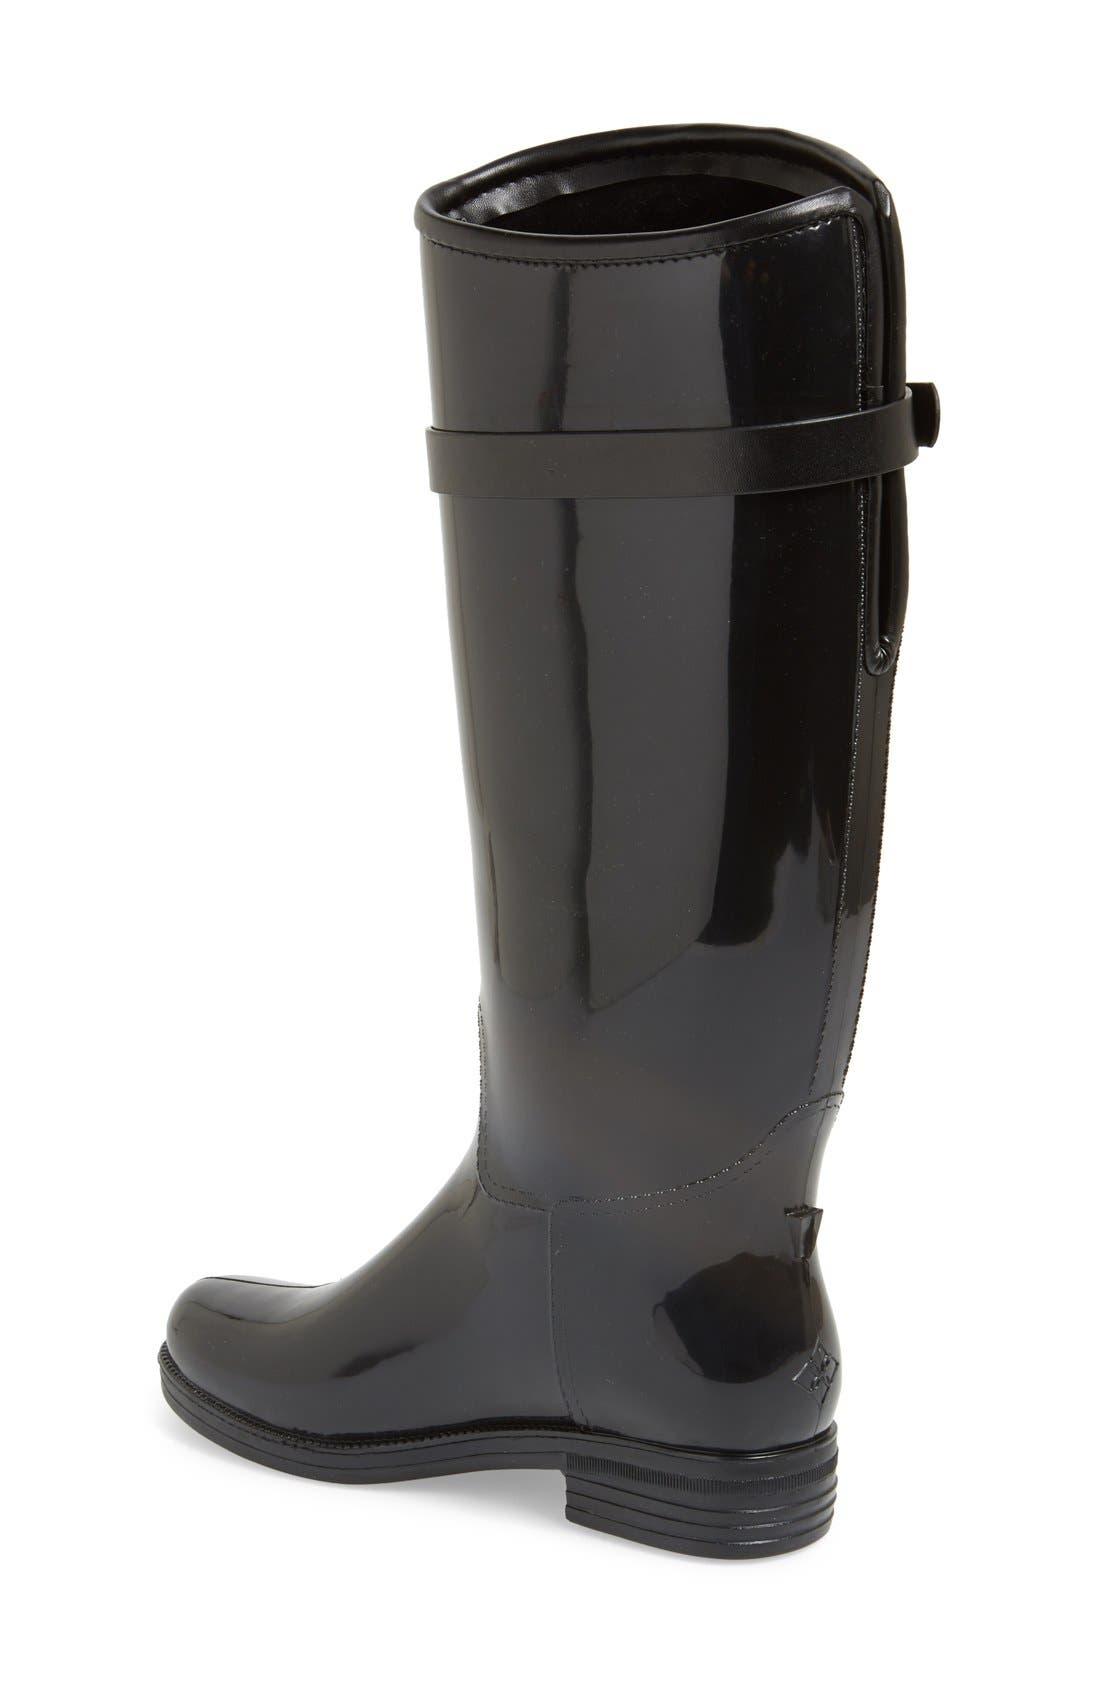 Bristol Weatherproof Knee High Rain Boot,                             Alternate thumbnail 2, color,                             001